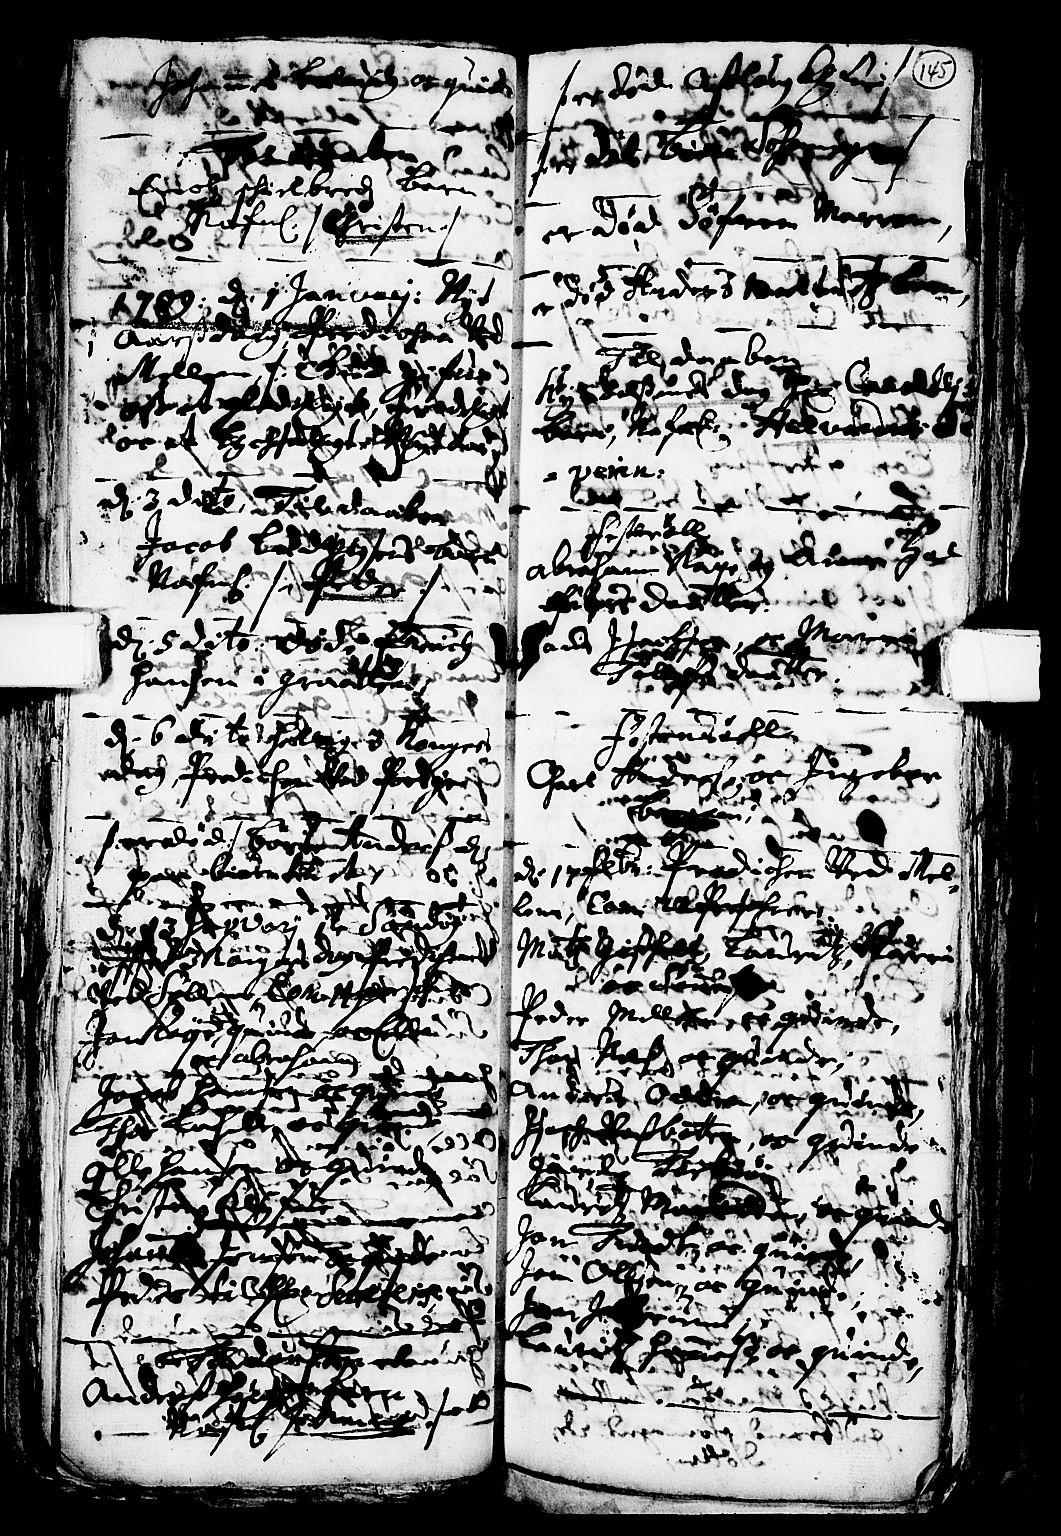 SAKO, Solum kirkebøker, F/Fa/L0001: Ministerialbok nr. I 1, 1701-1716, s. 145